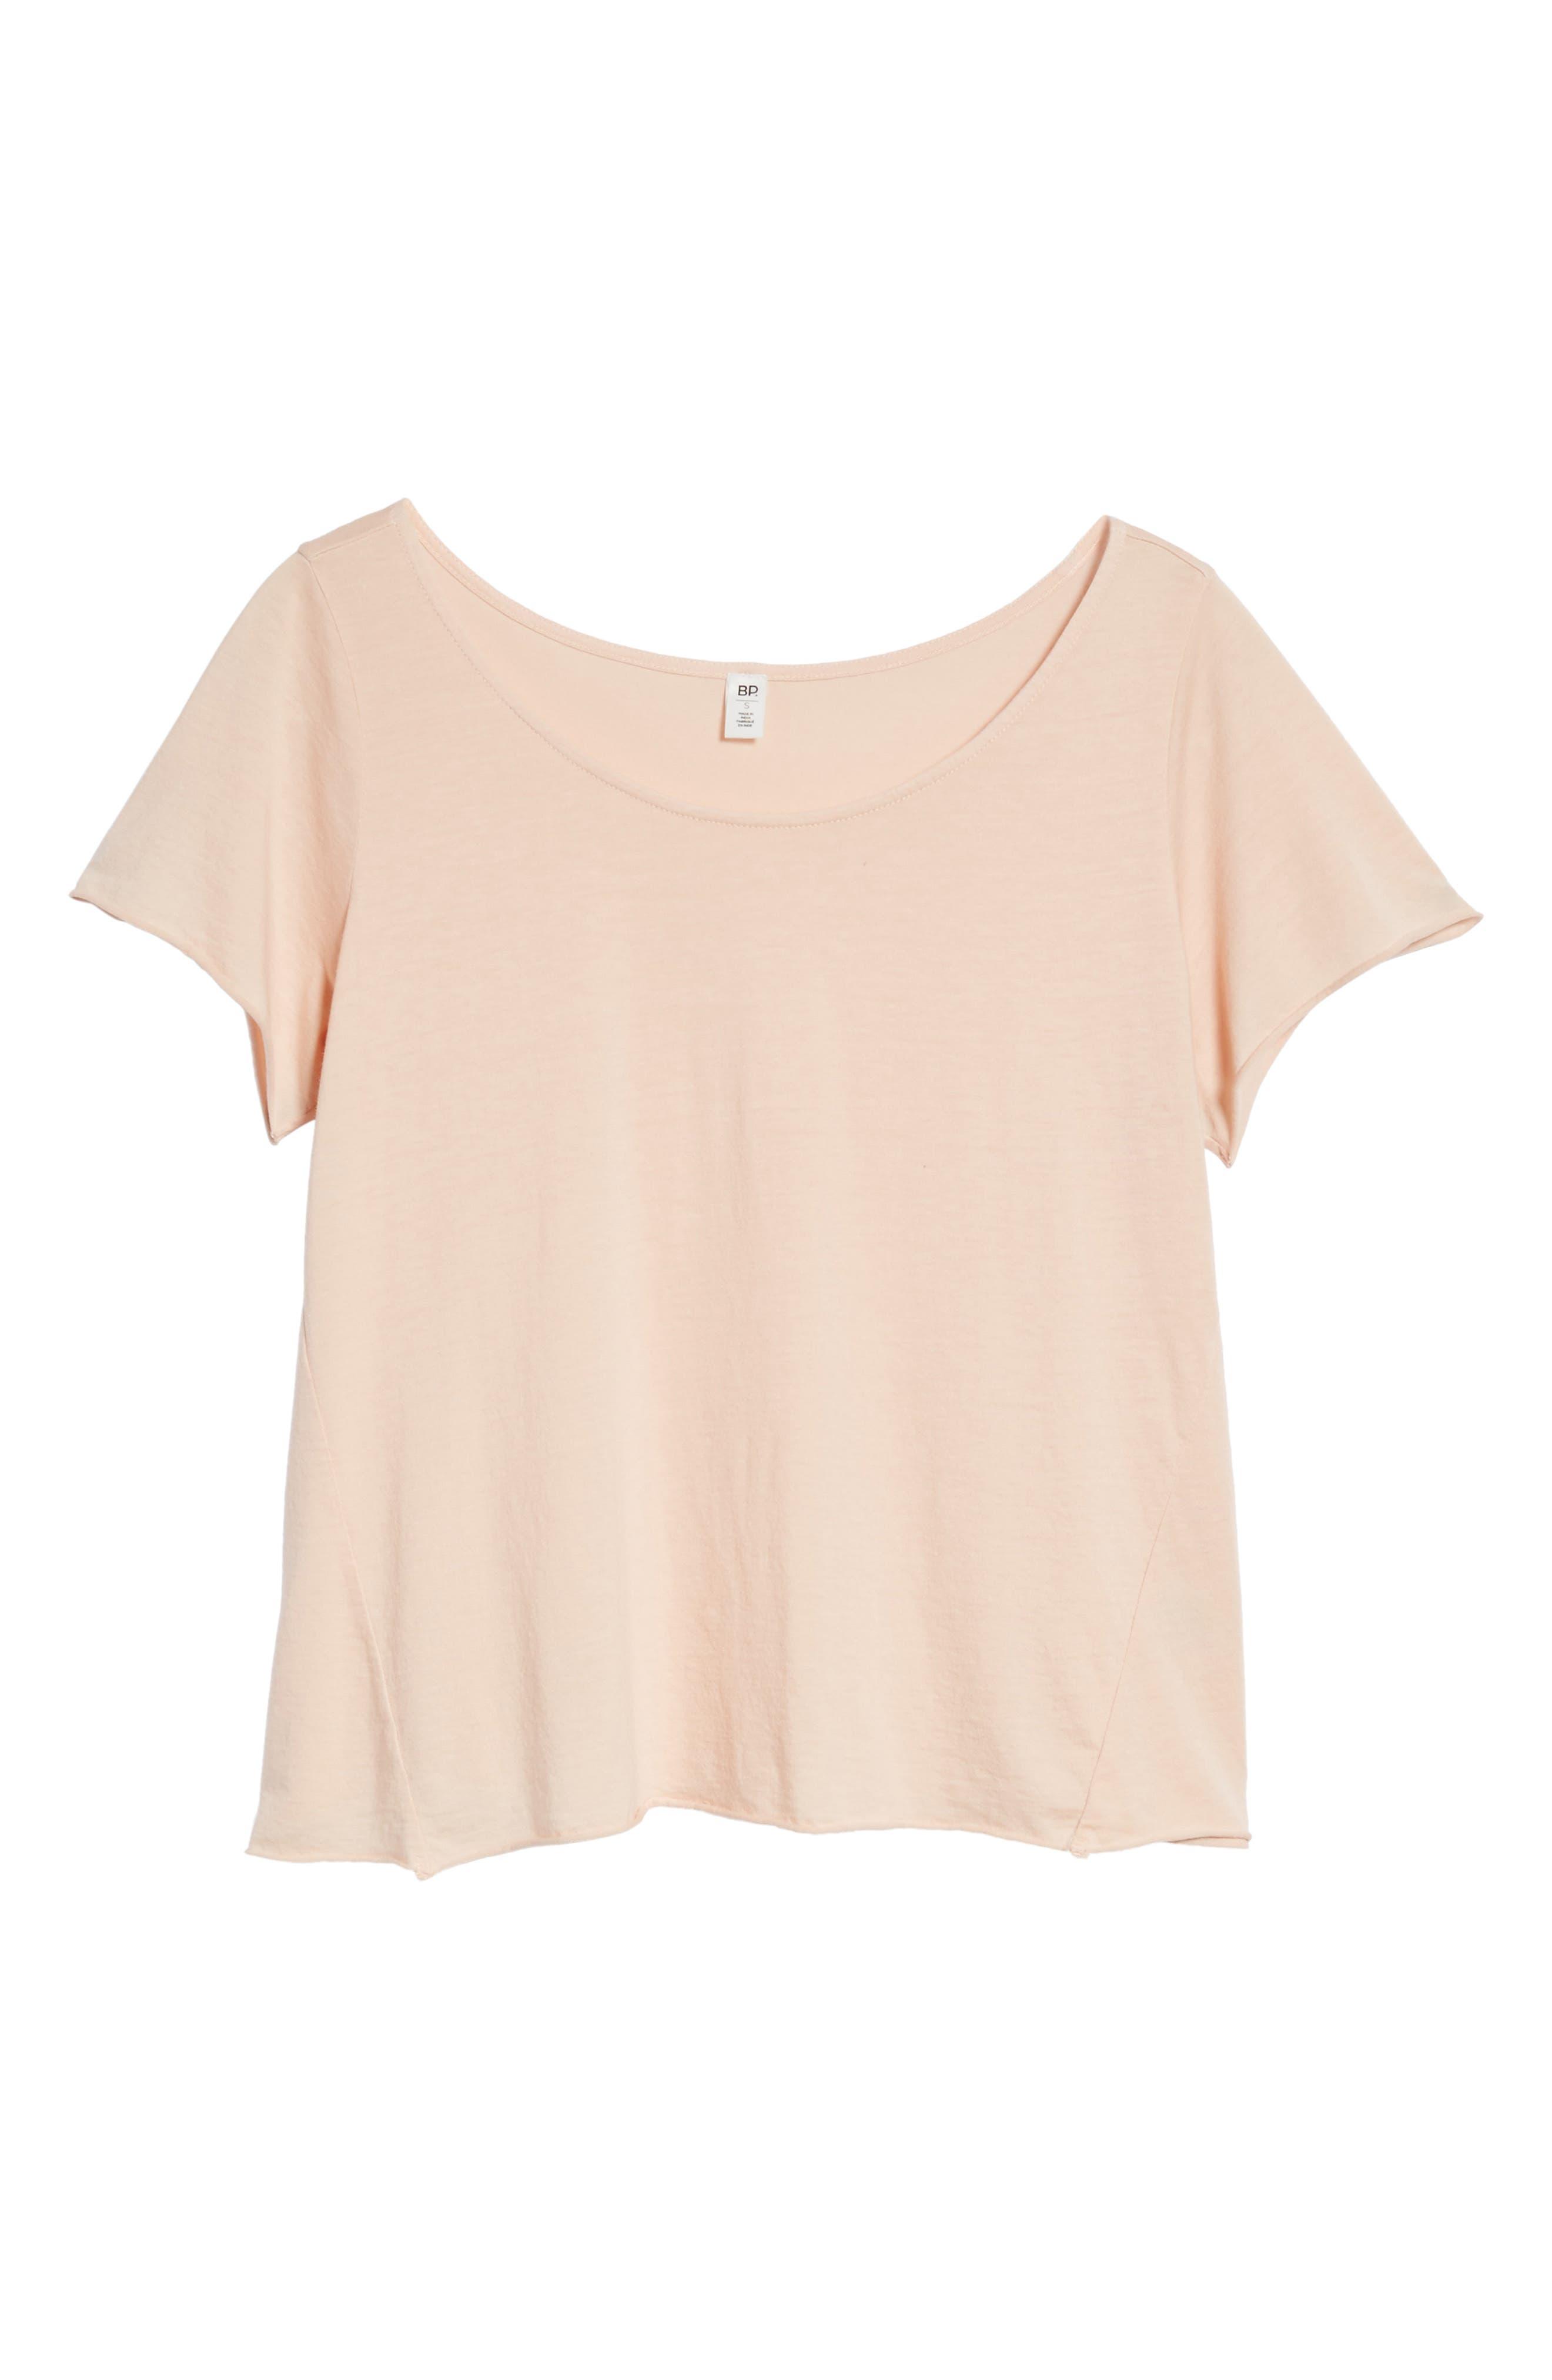 Cotton & Modal Rolled Hem Tee,                             Alternate thumbnail 6, color,                             Pink Hero